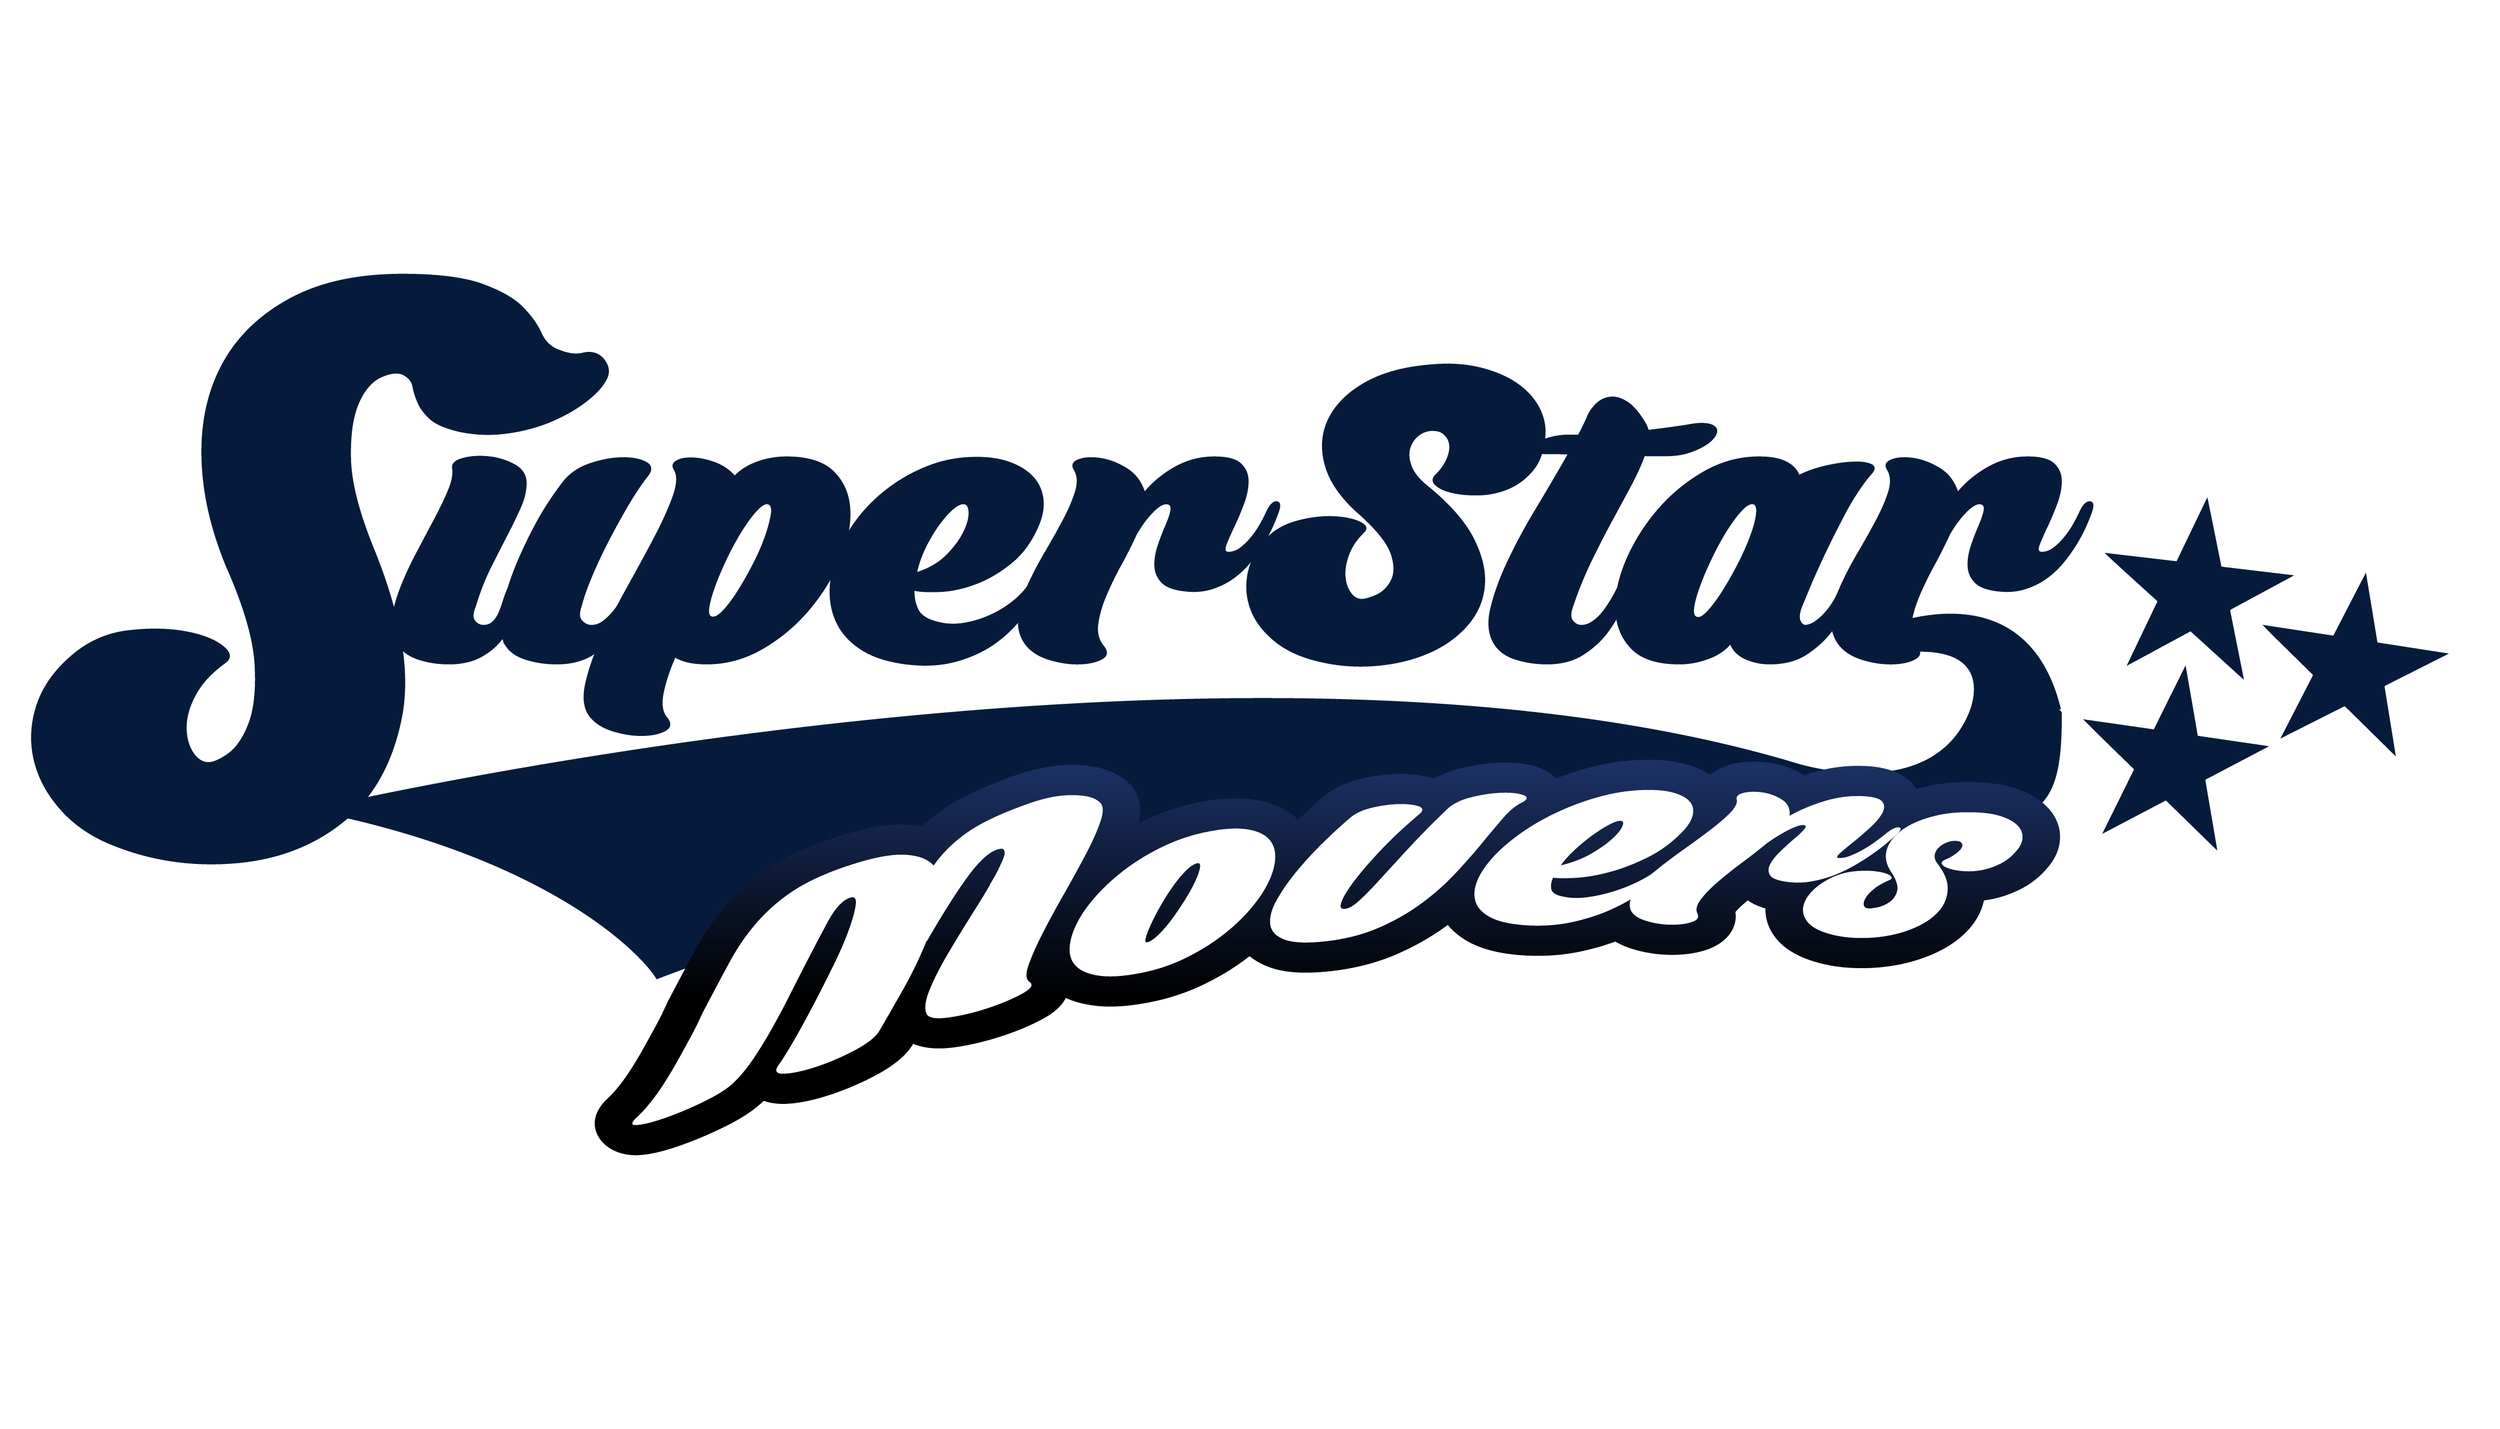 8x14-SuperStarMovers-01.jpg